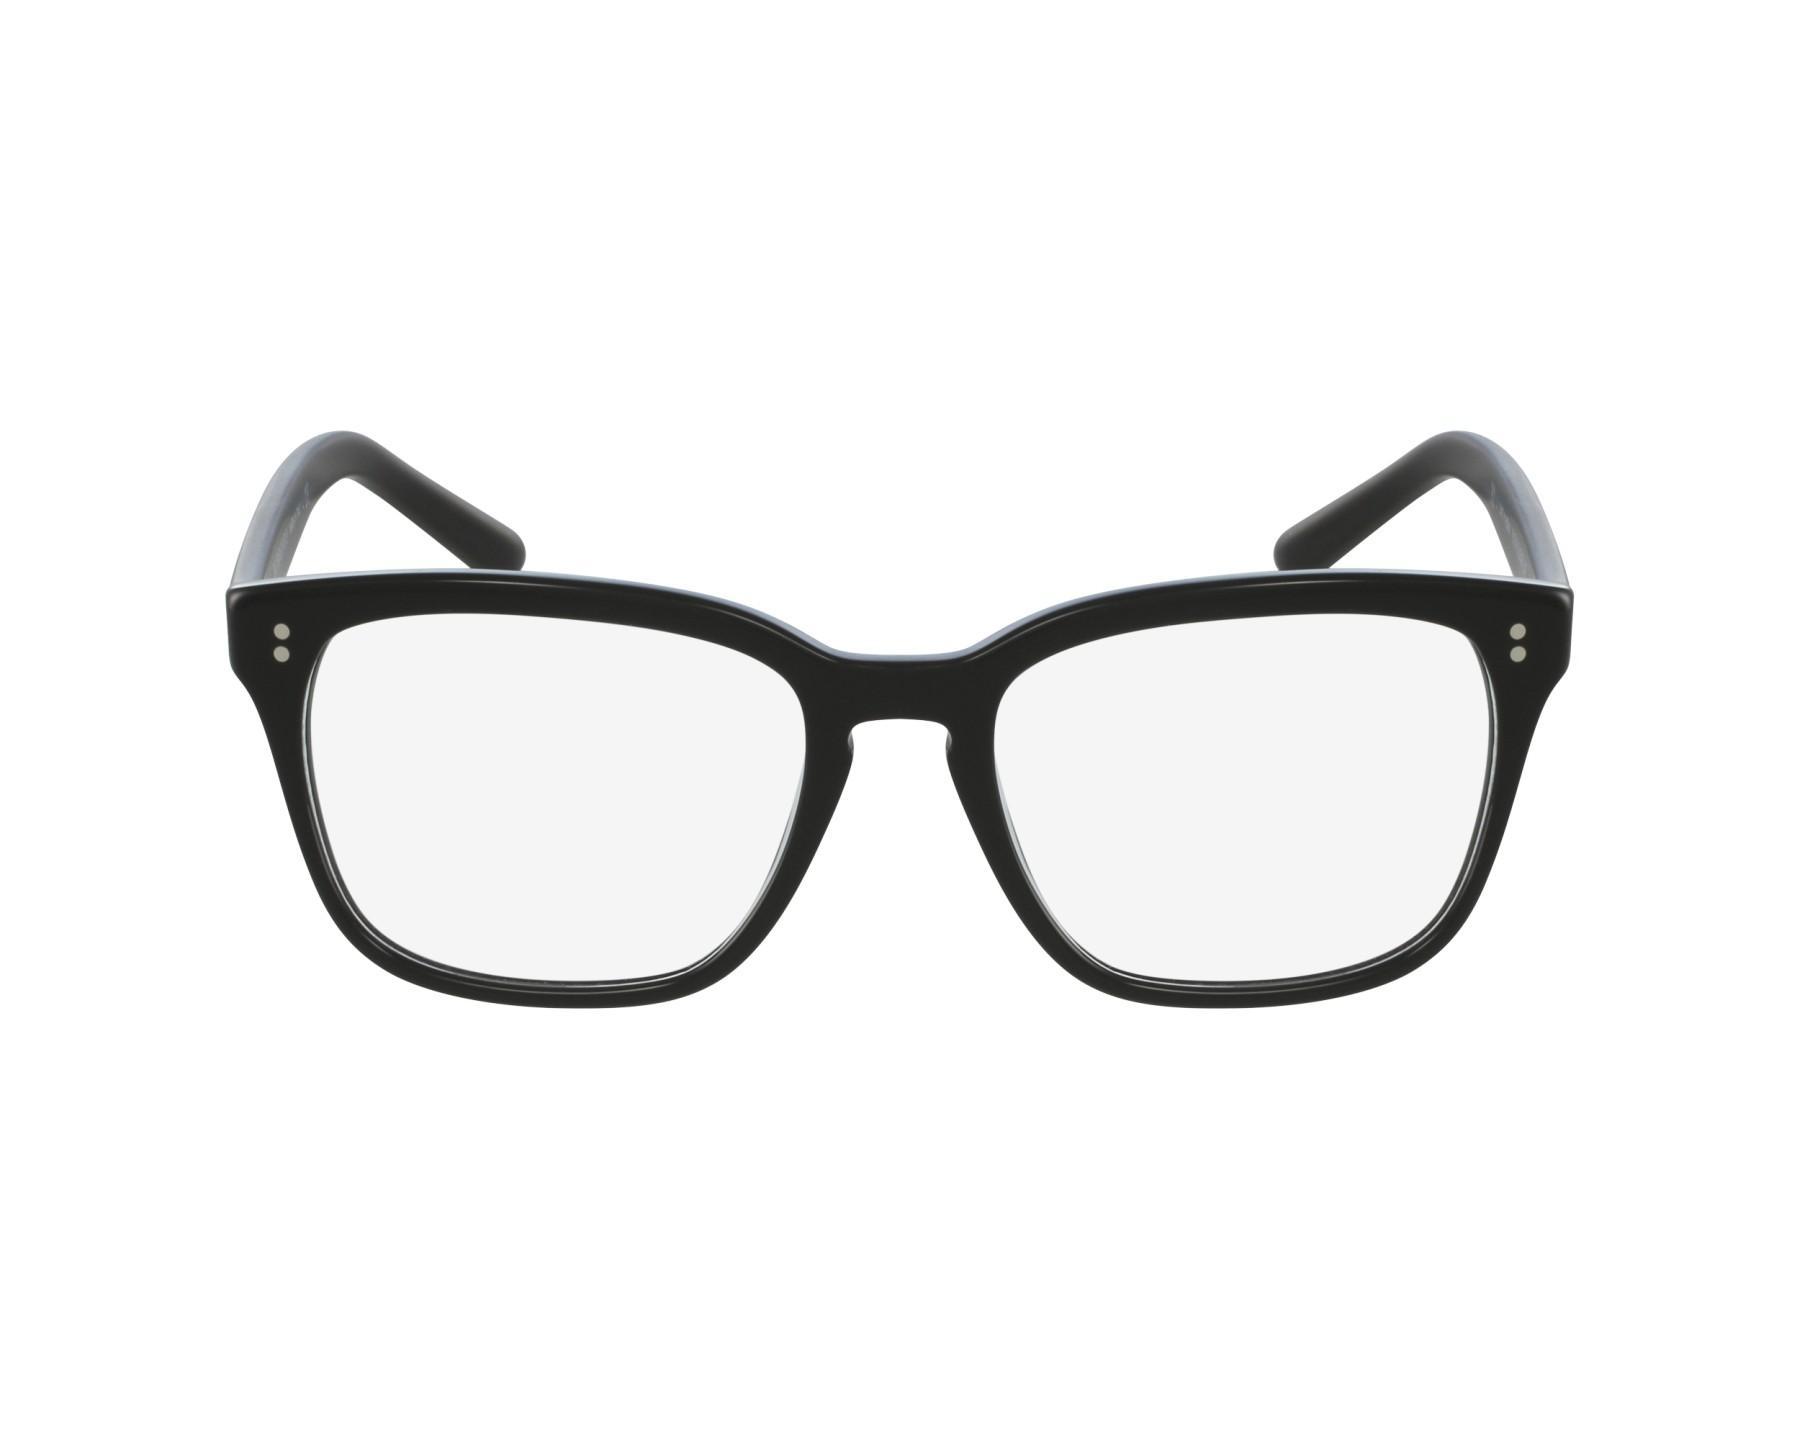 085a0f78785e eyeglasses Burberry BE-2225 3001 - Black Black profile view